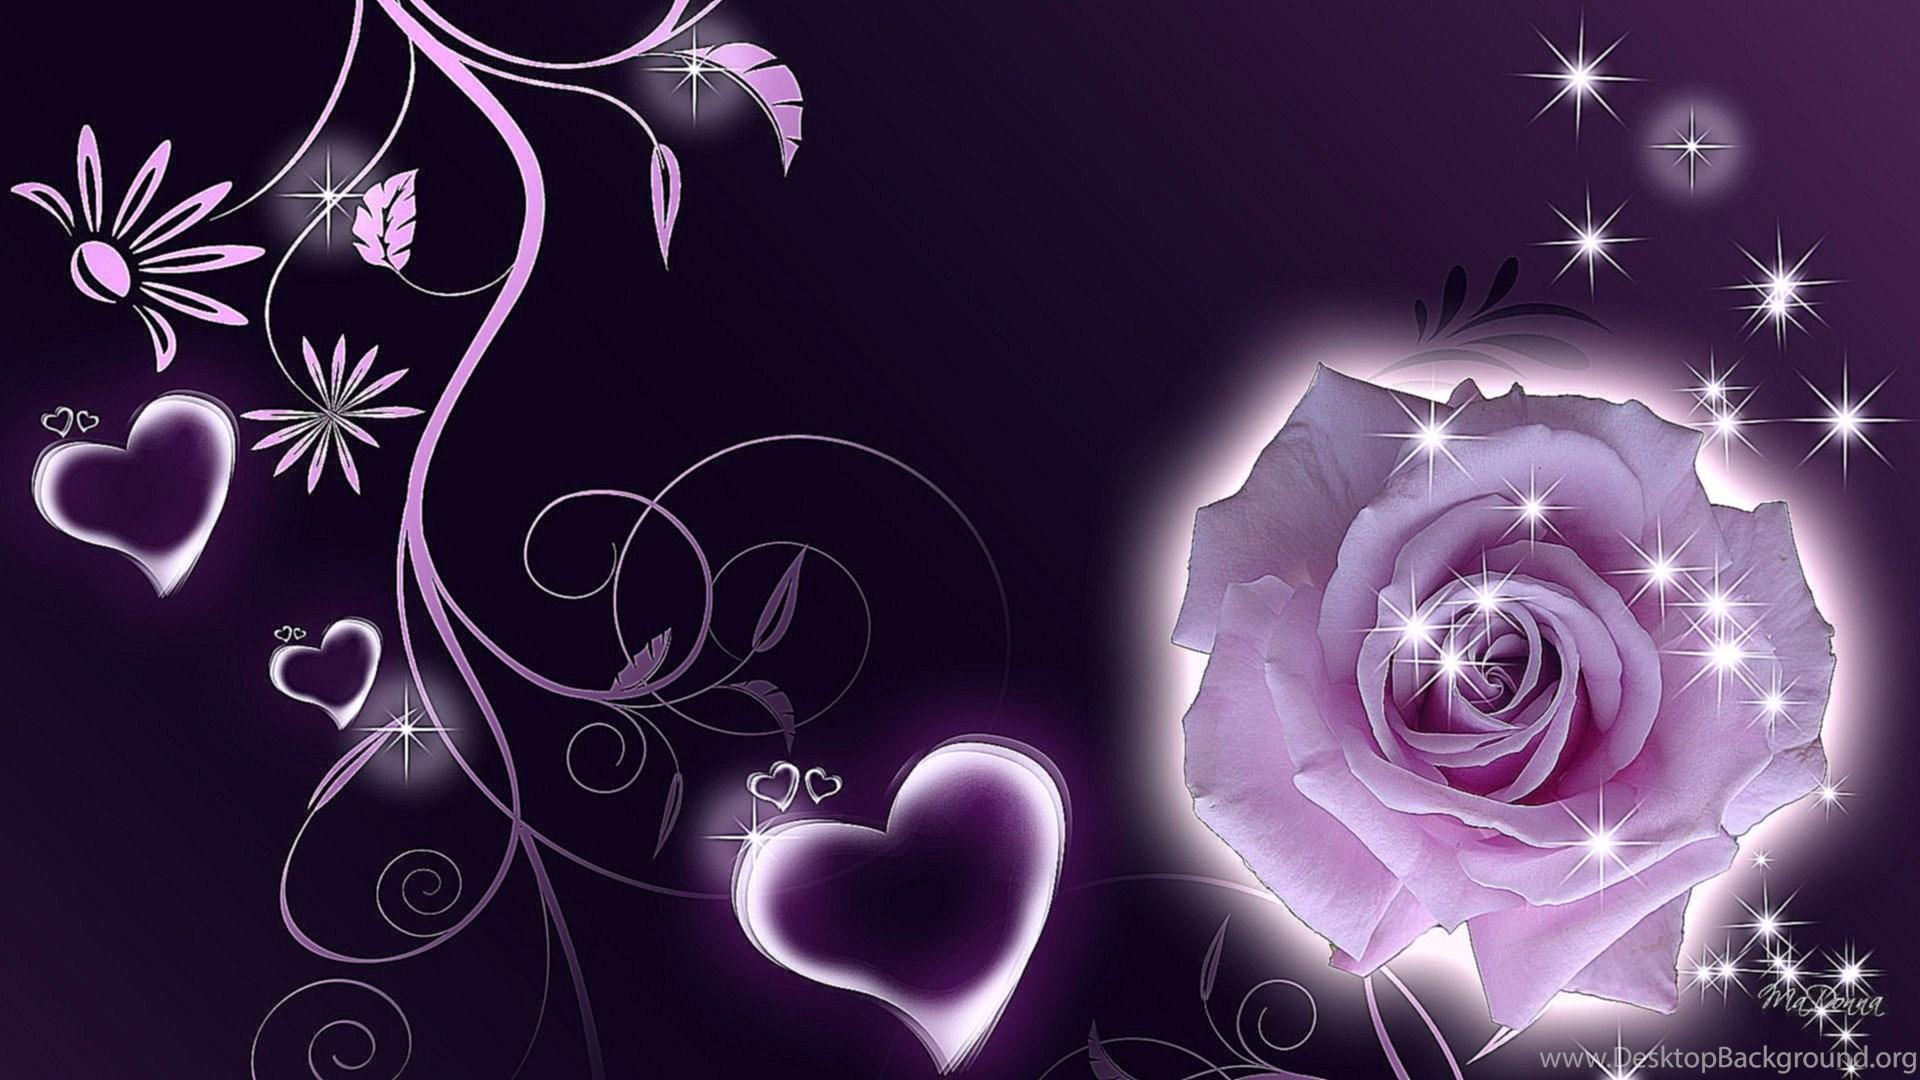 Purple And Black Hearts Wallpaper: Purple Hearts Wallpapers 3 Items Desktop Background